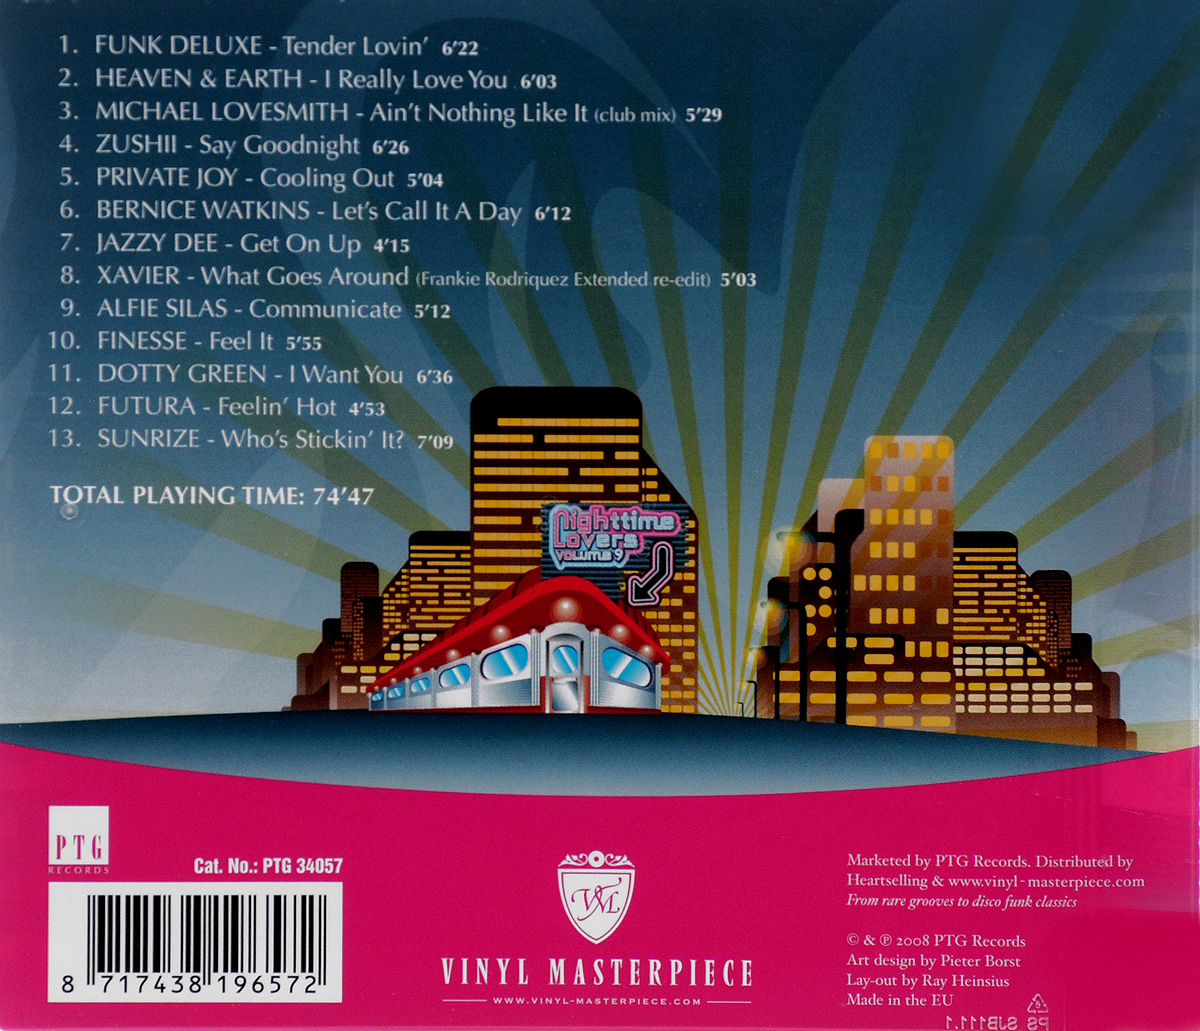 Nighttime Lovers.  Volume 9 PTG Records,Волтэкс-инвест